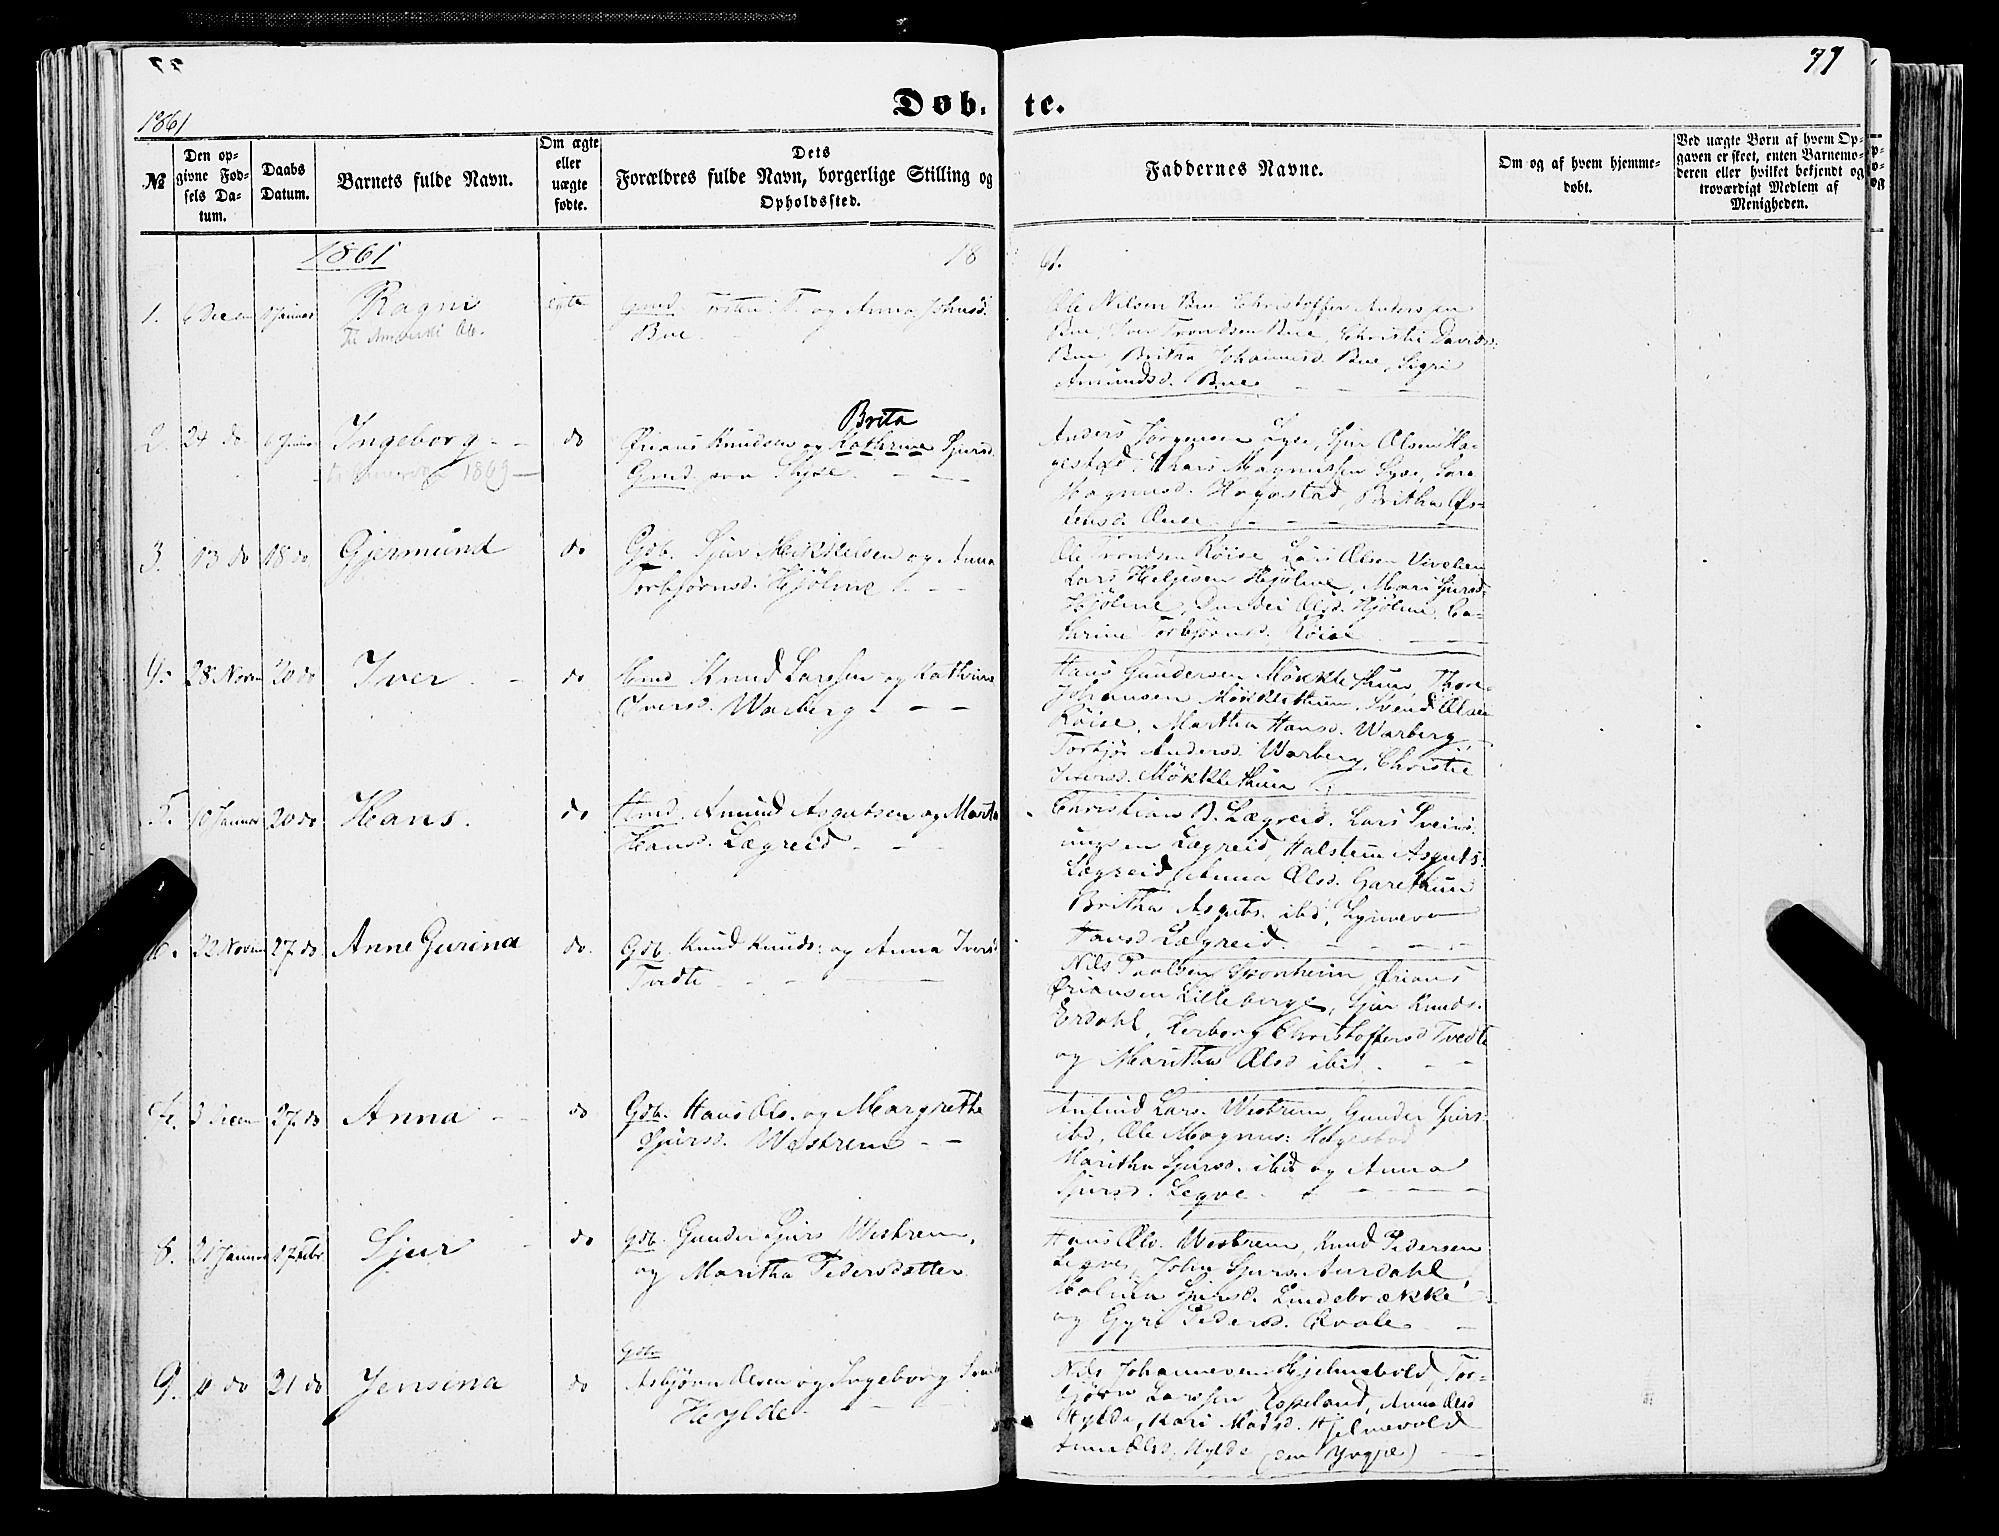 SAB, Ulvik sokneprestembete, H/Haa: Parish register (official) no. A 13, 1853-1863, p. 77